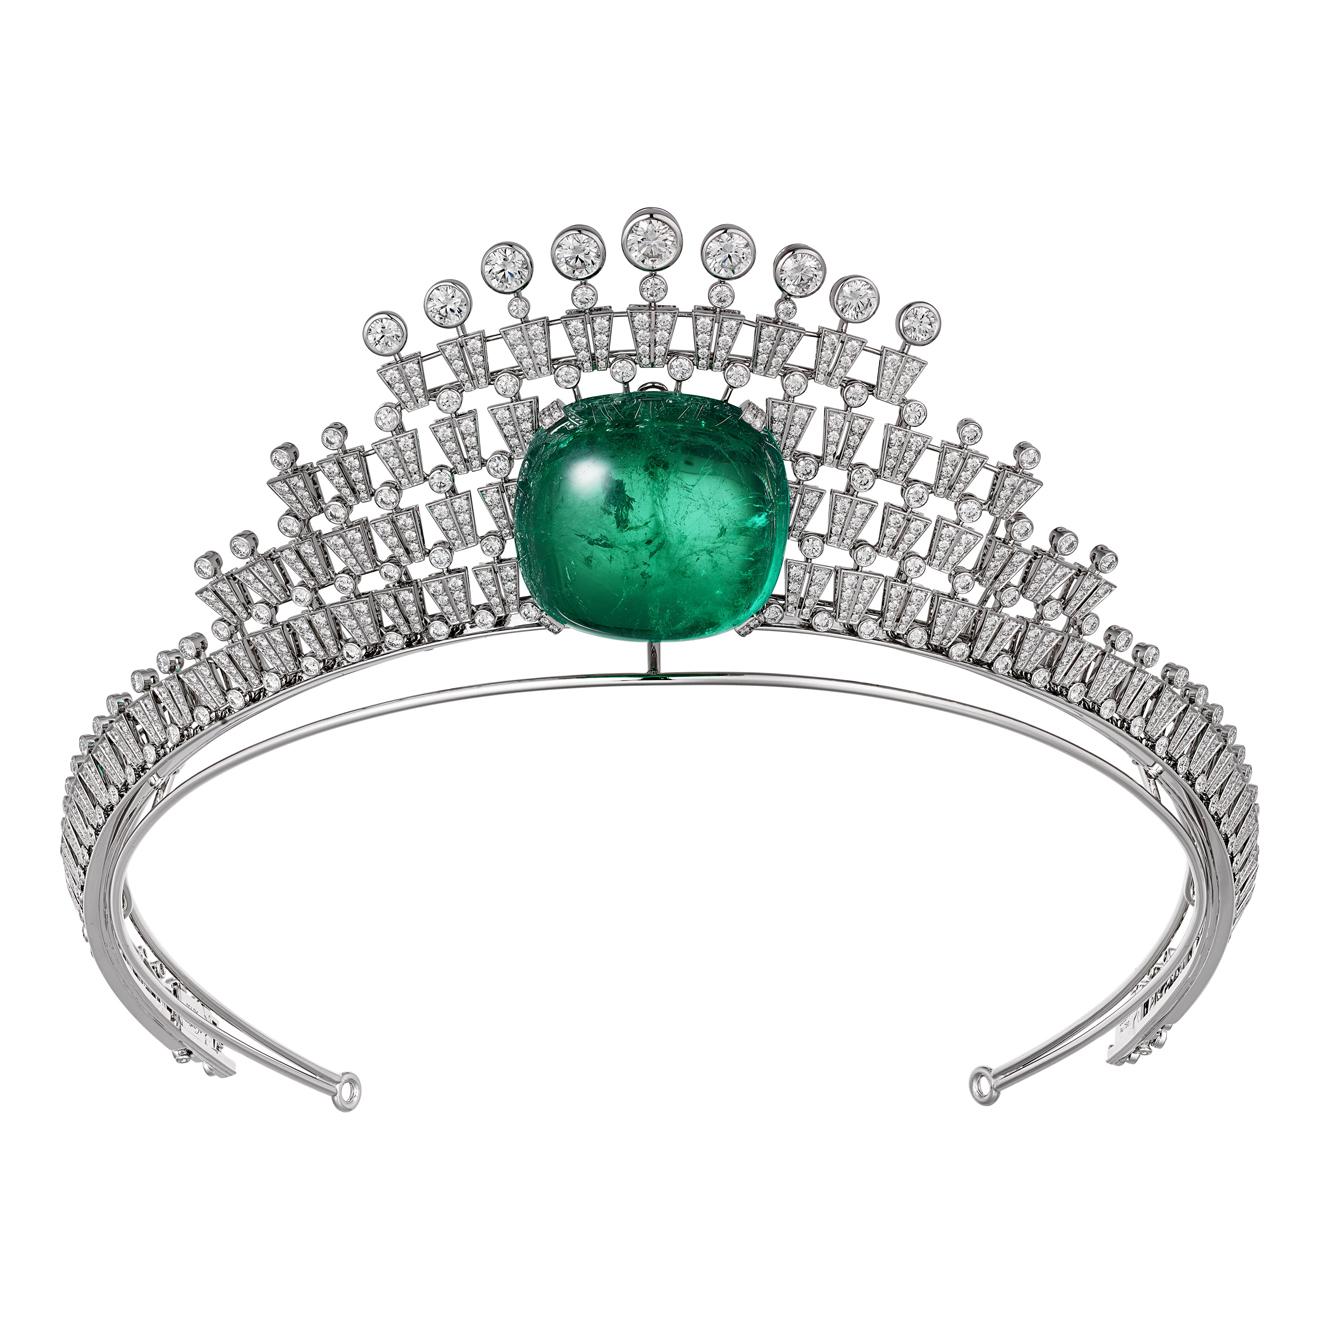 Hyperbole祖母綠鑽石冠冕,可轉換成項鍊配戴by Cartier。